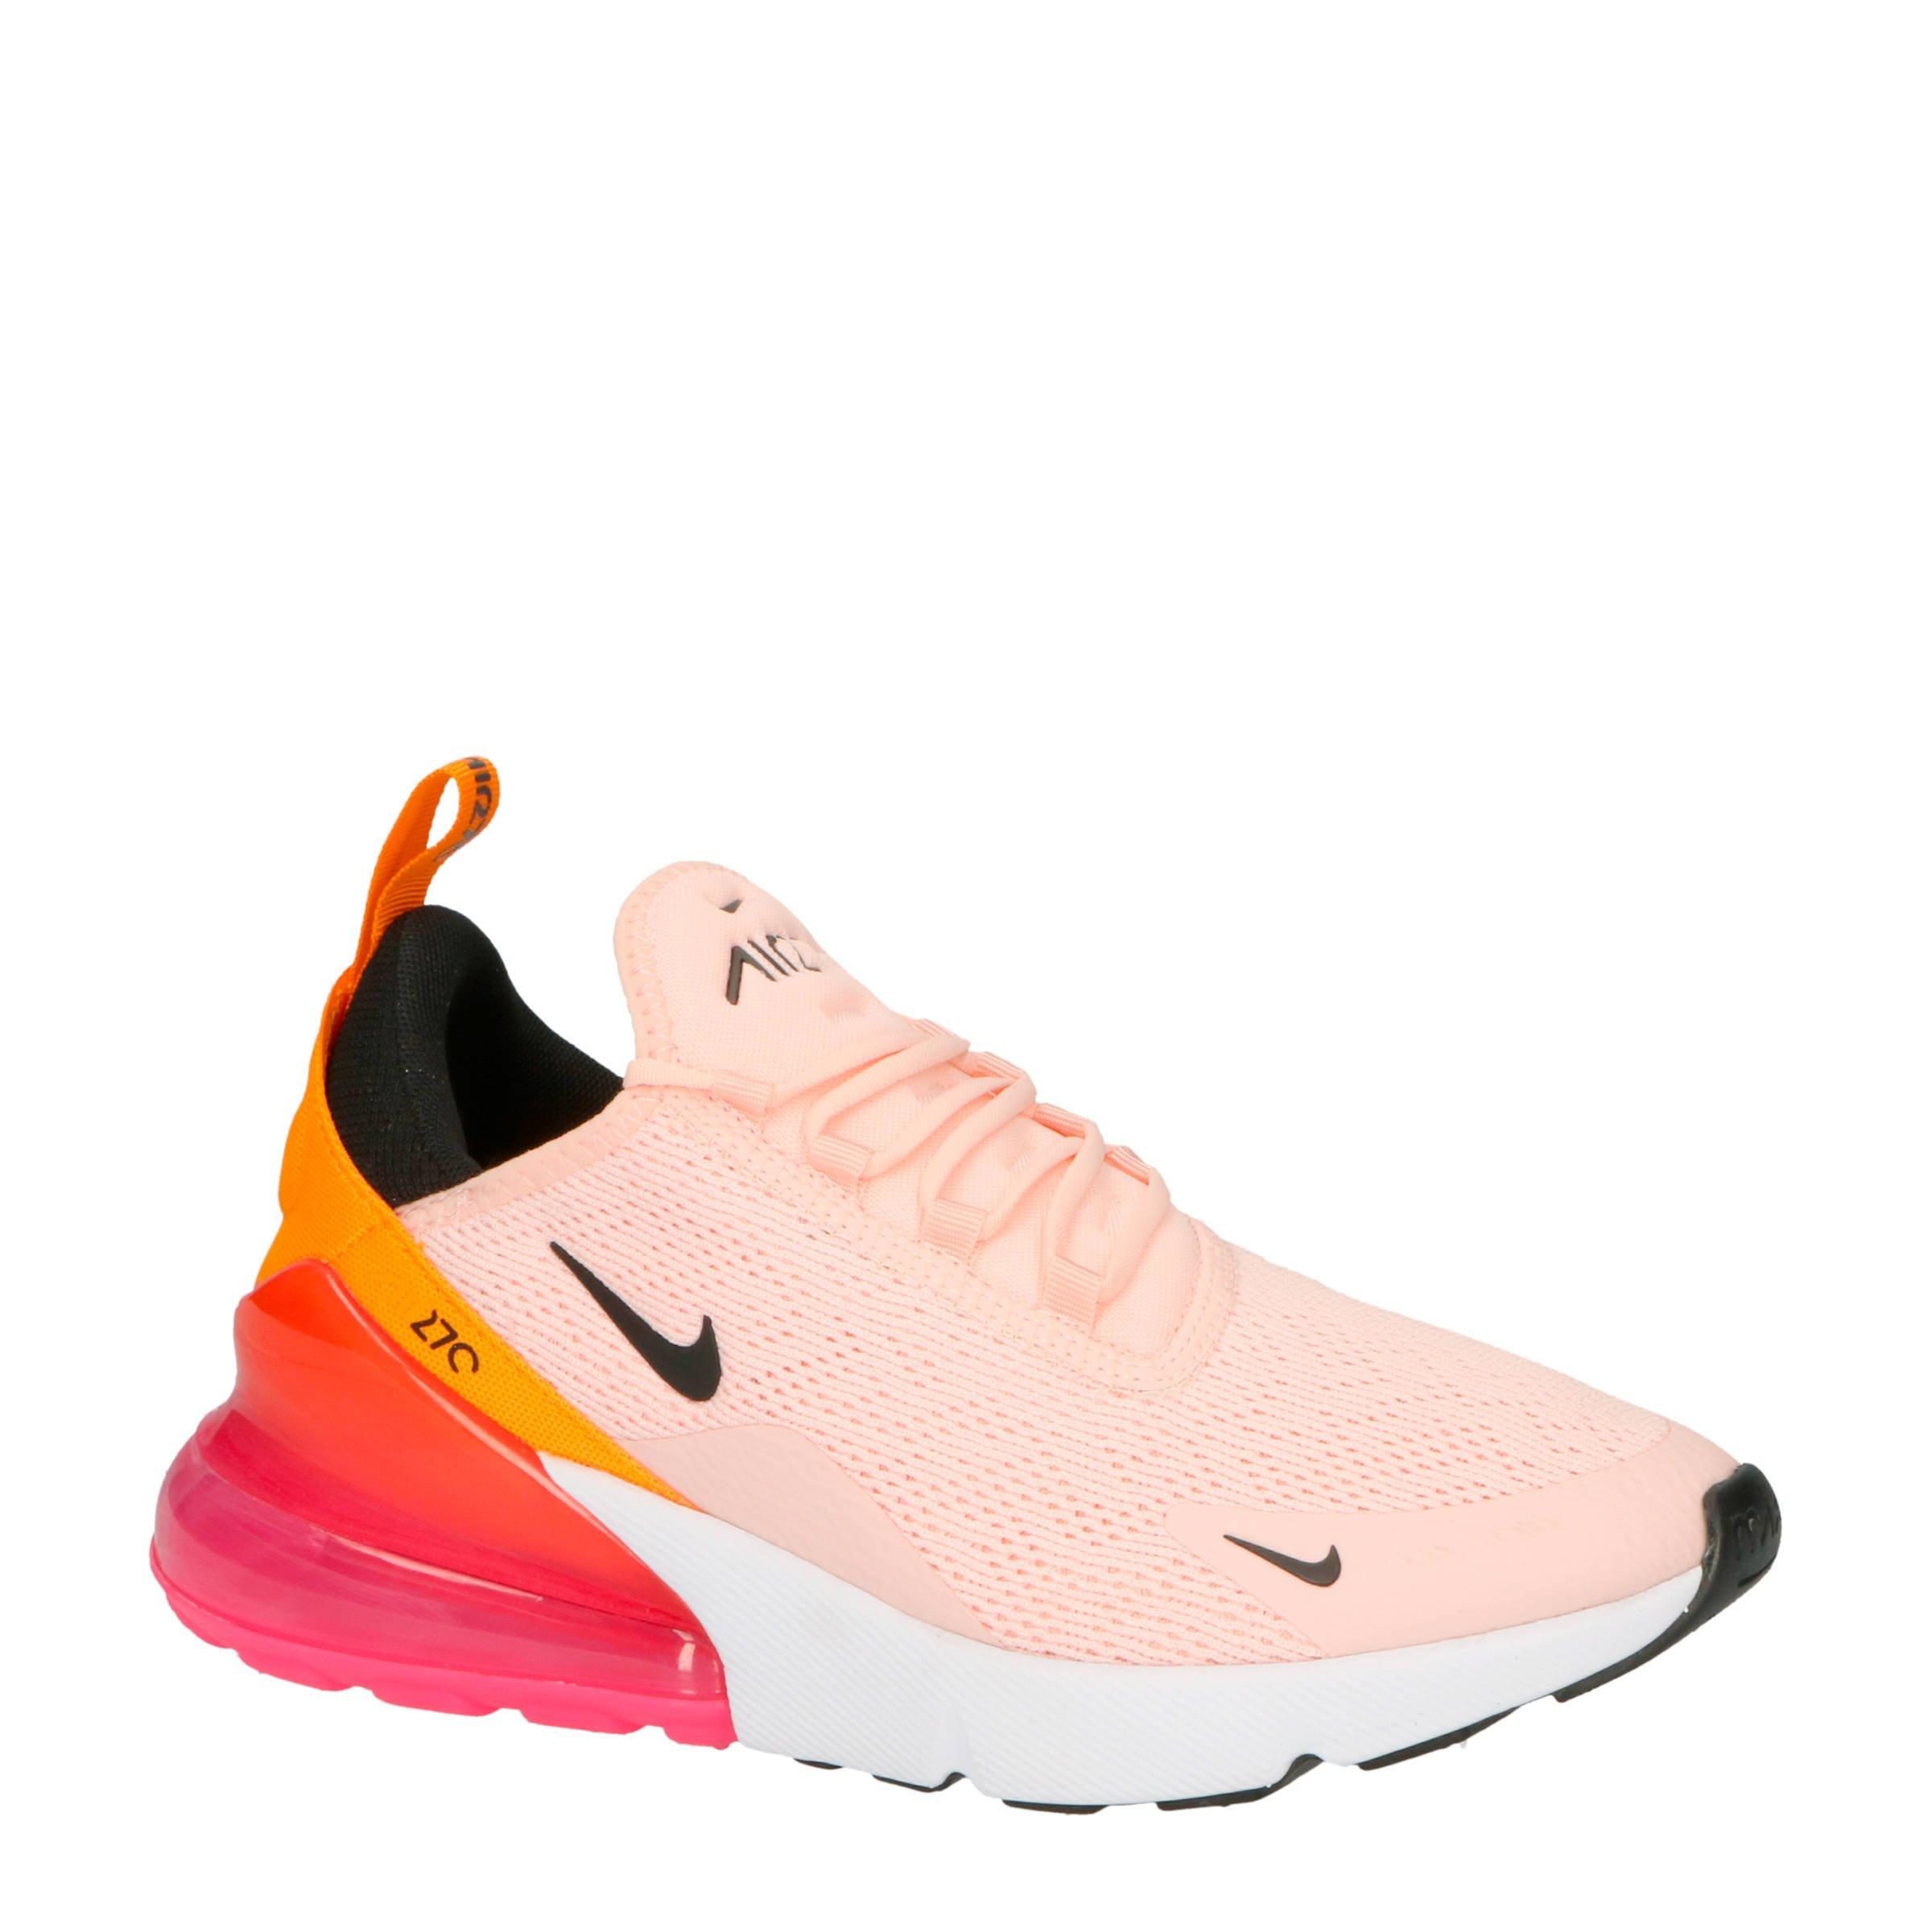 nike air max roze oranje